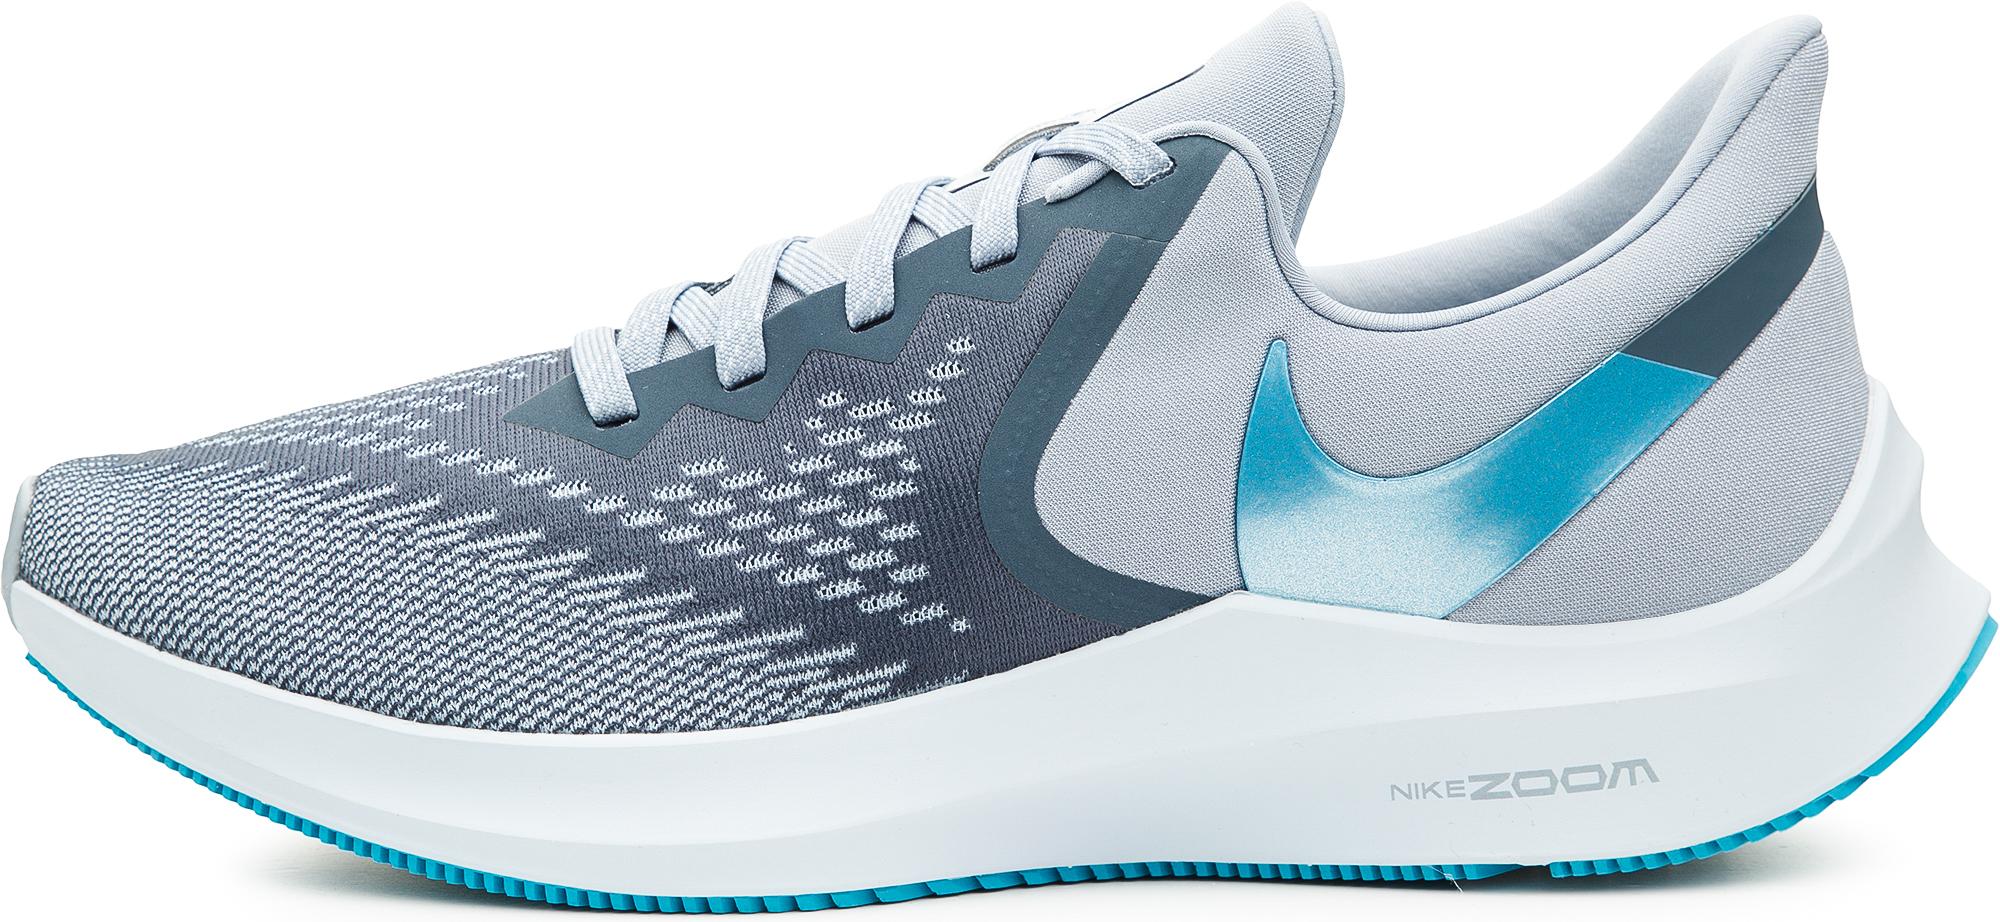 Nike Кроссовки мужские Nike Zoom Winflo 6, размер 44 nike кроссовки мужские nike air zoom vapor x clay размер 45